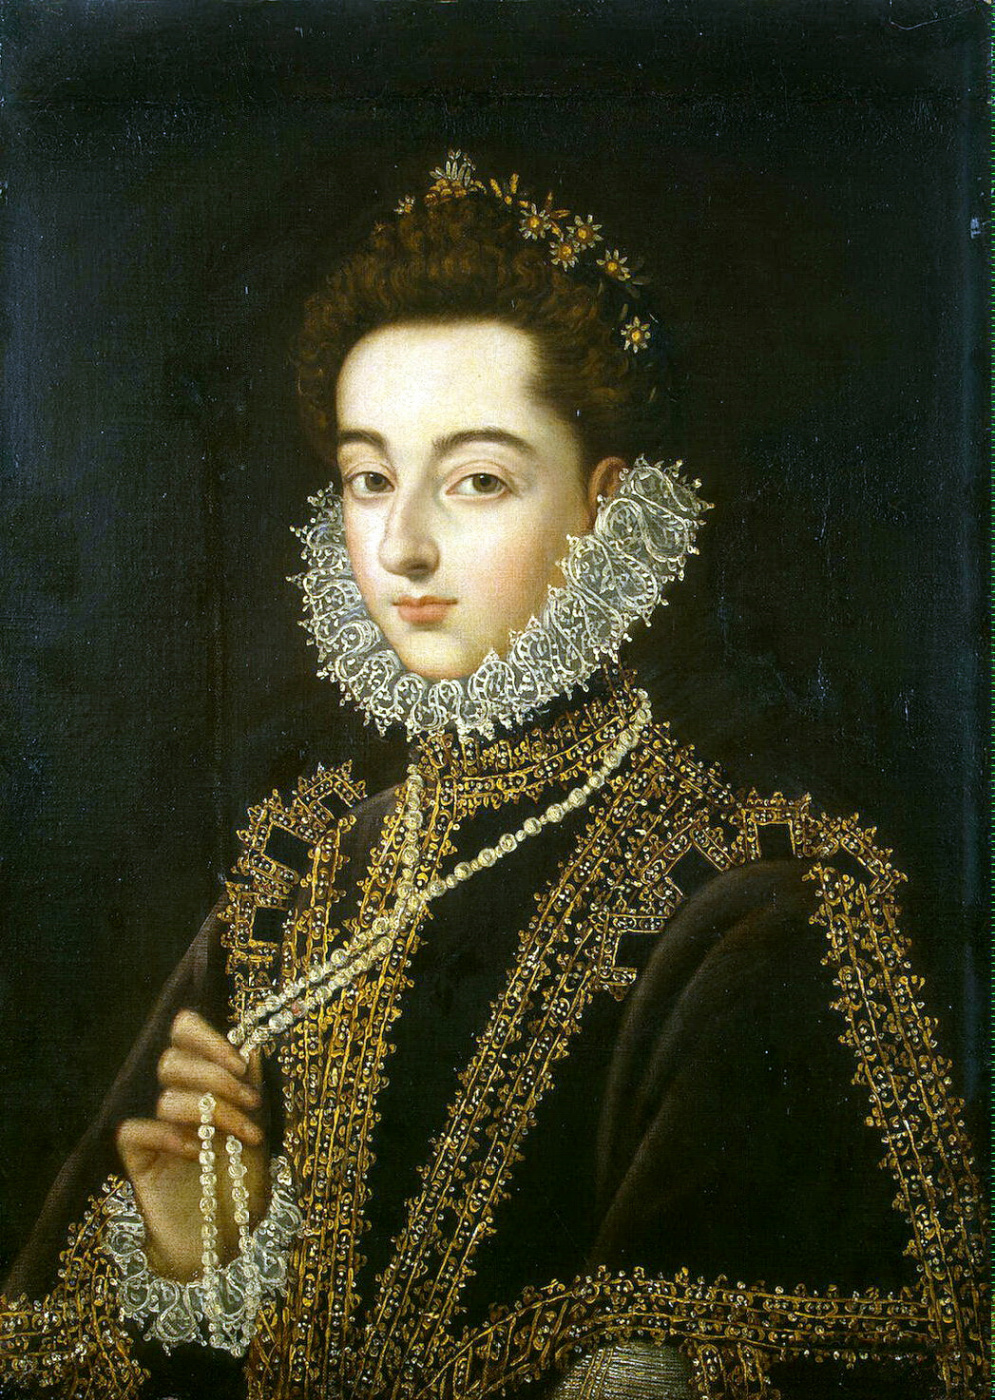 Alonso Sanchez Coello. Portrait of the Infanta Catalina Micaela Austrian